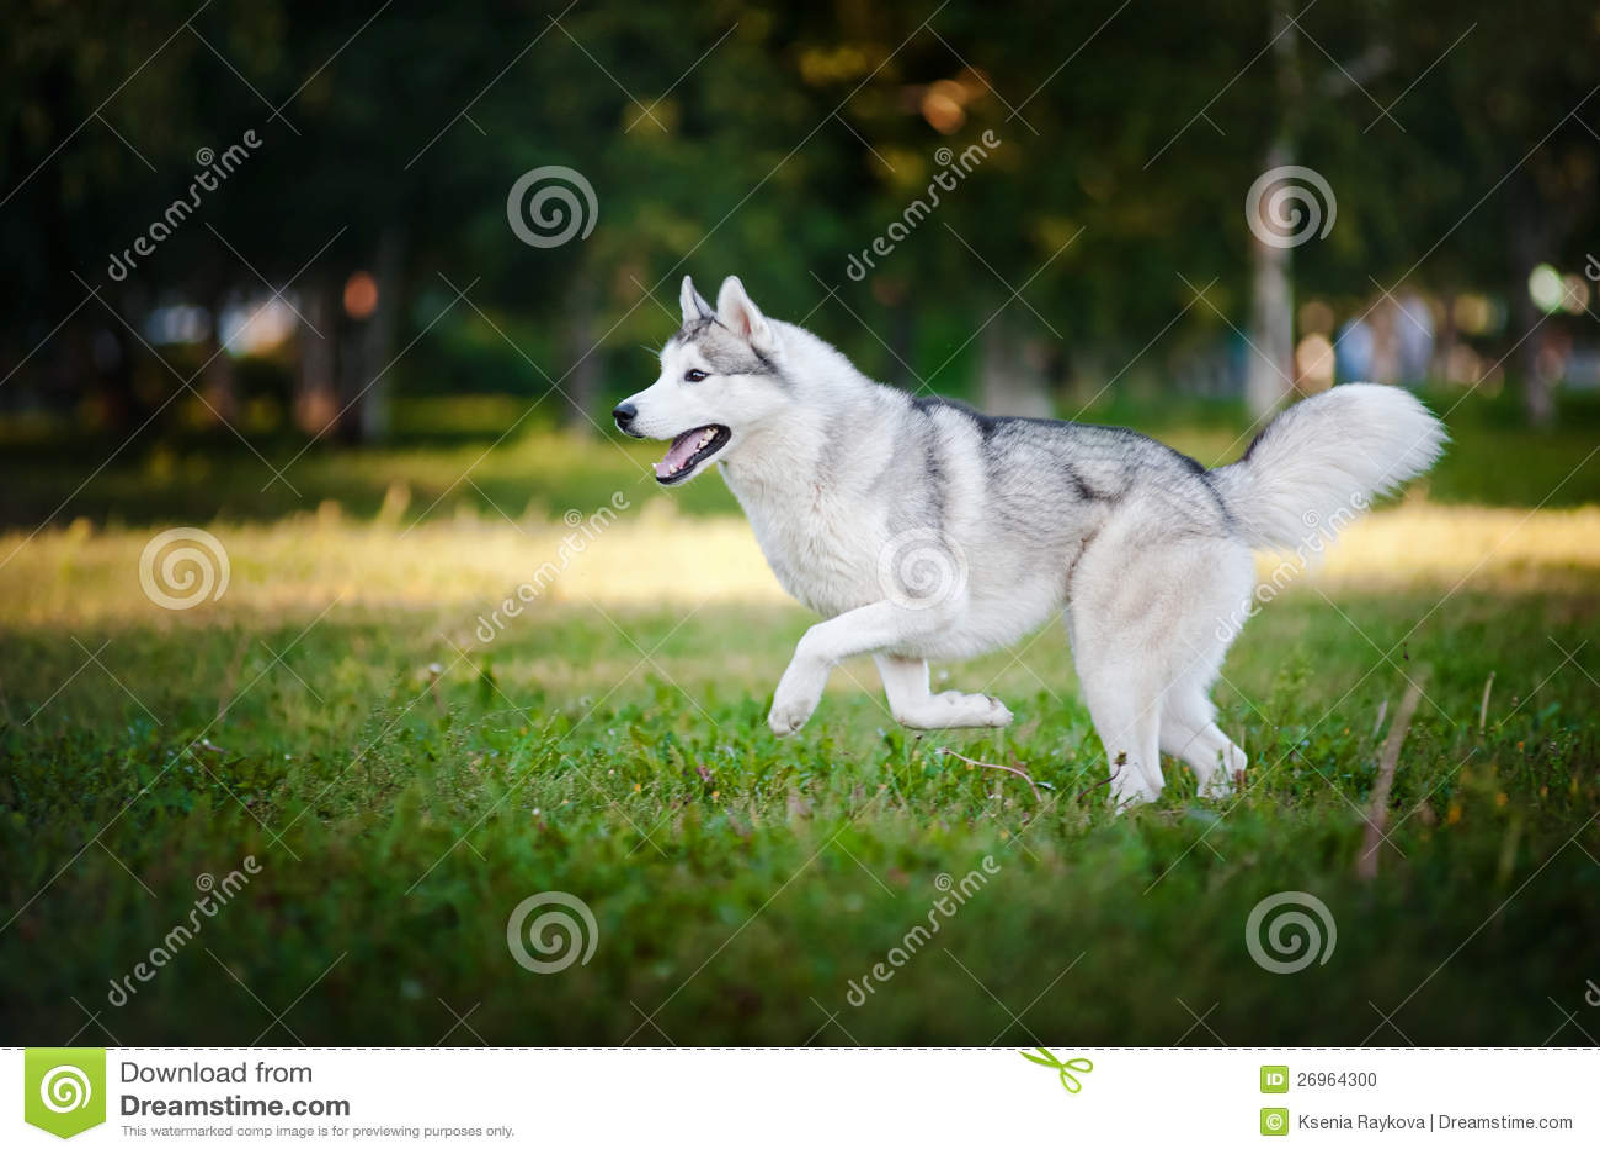 Cute Dog Husky Running On The Grass Stock Photo Image Of Animals